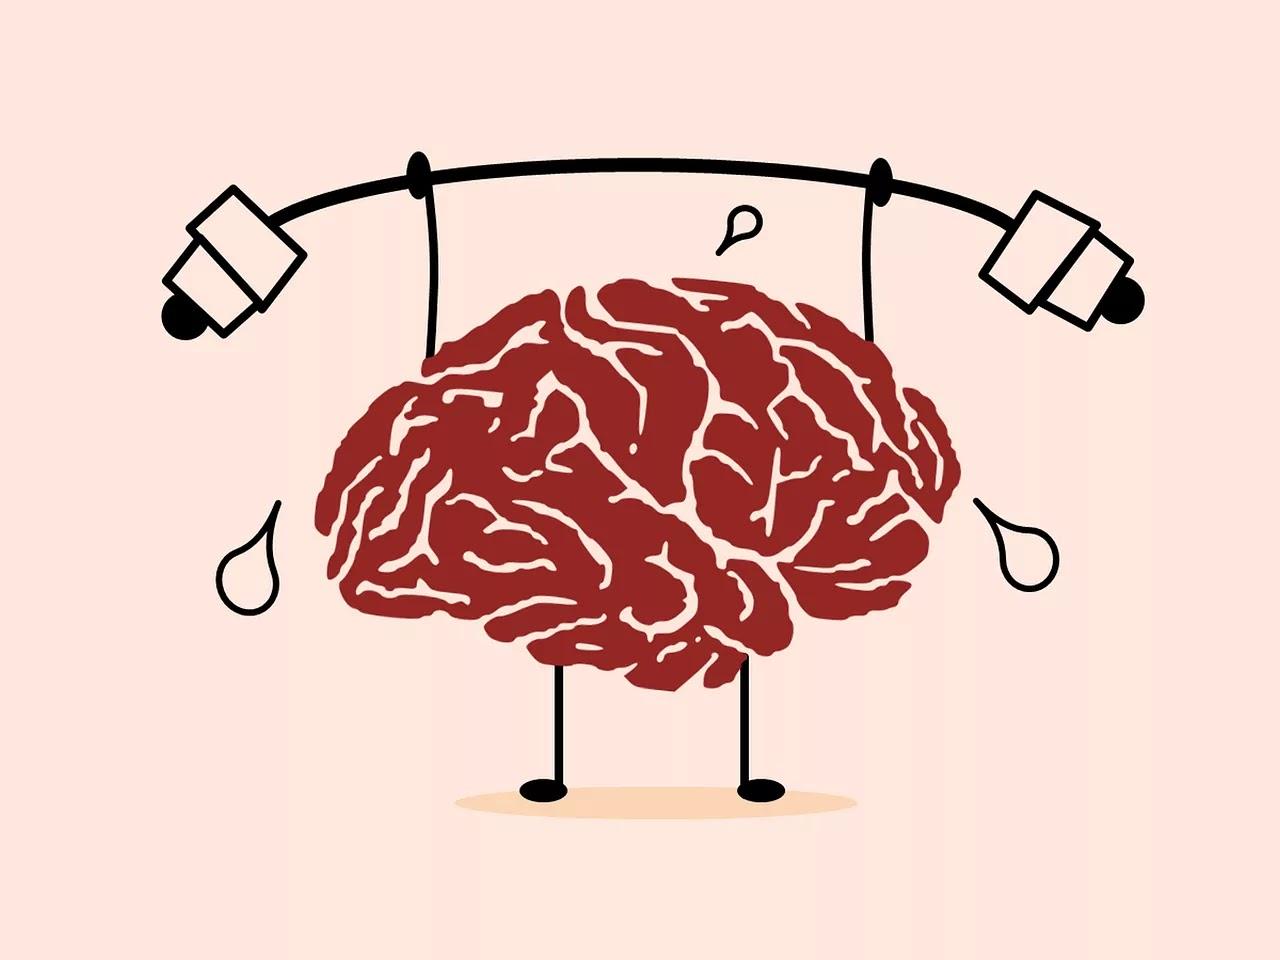 मस्तिष्क को तेज बनाने के लिए 13 मस्तिष्क व्यायाम